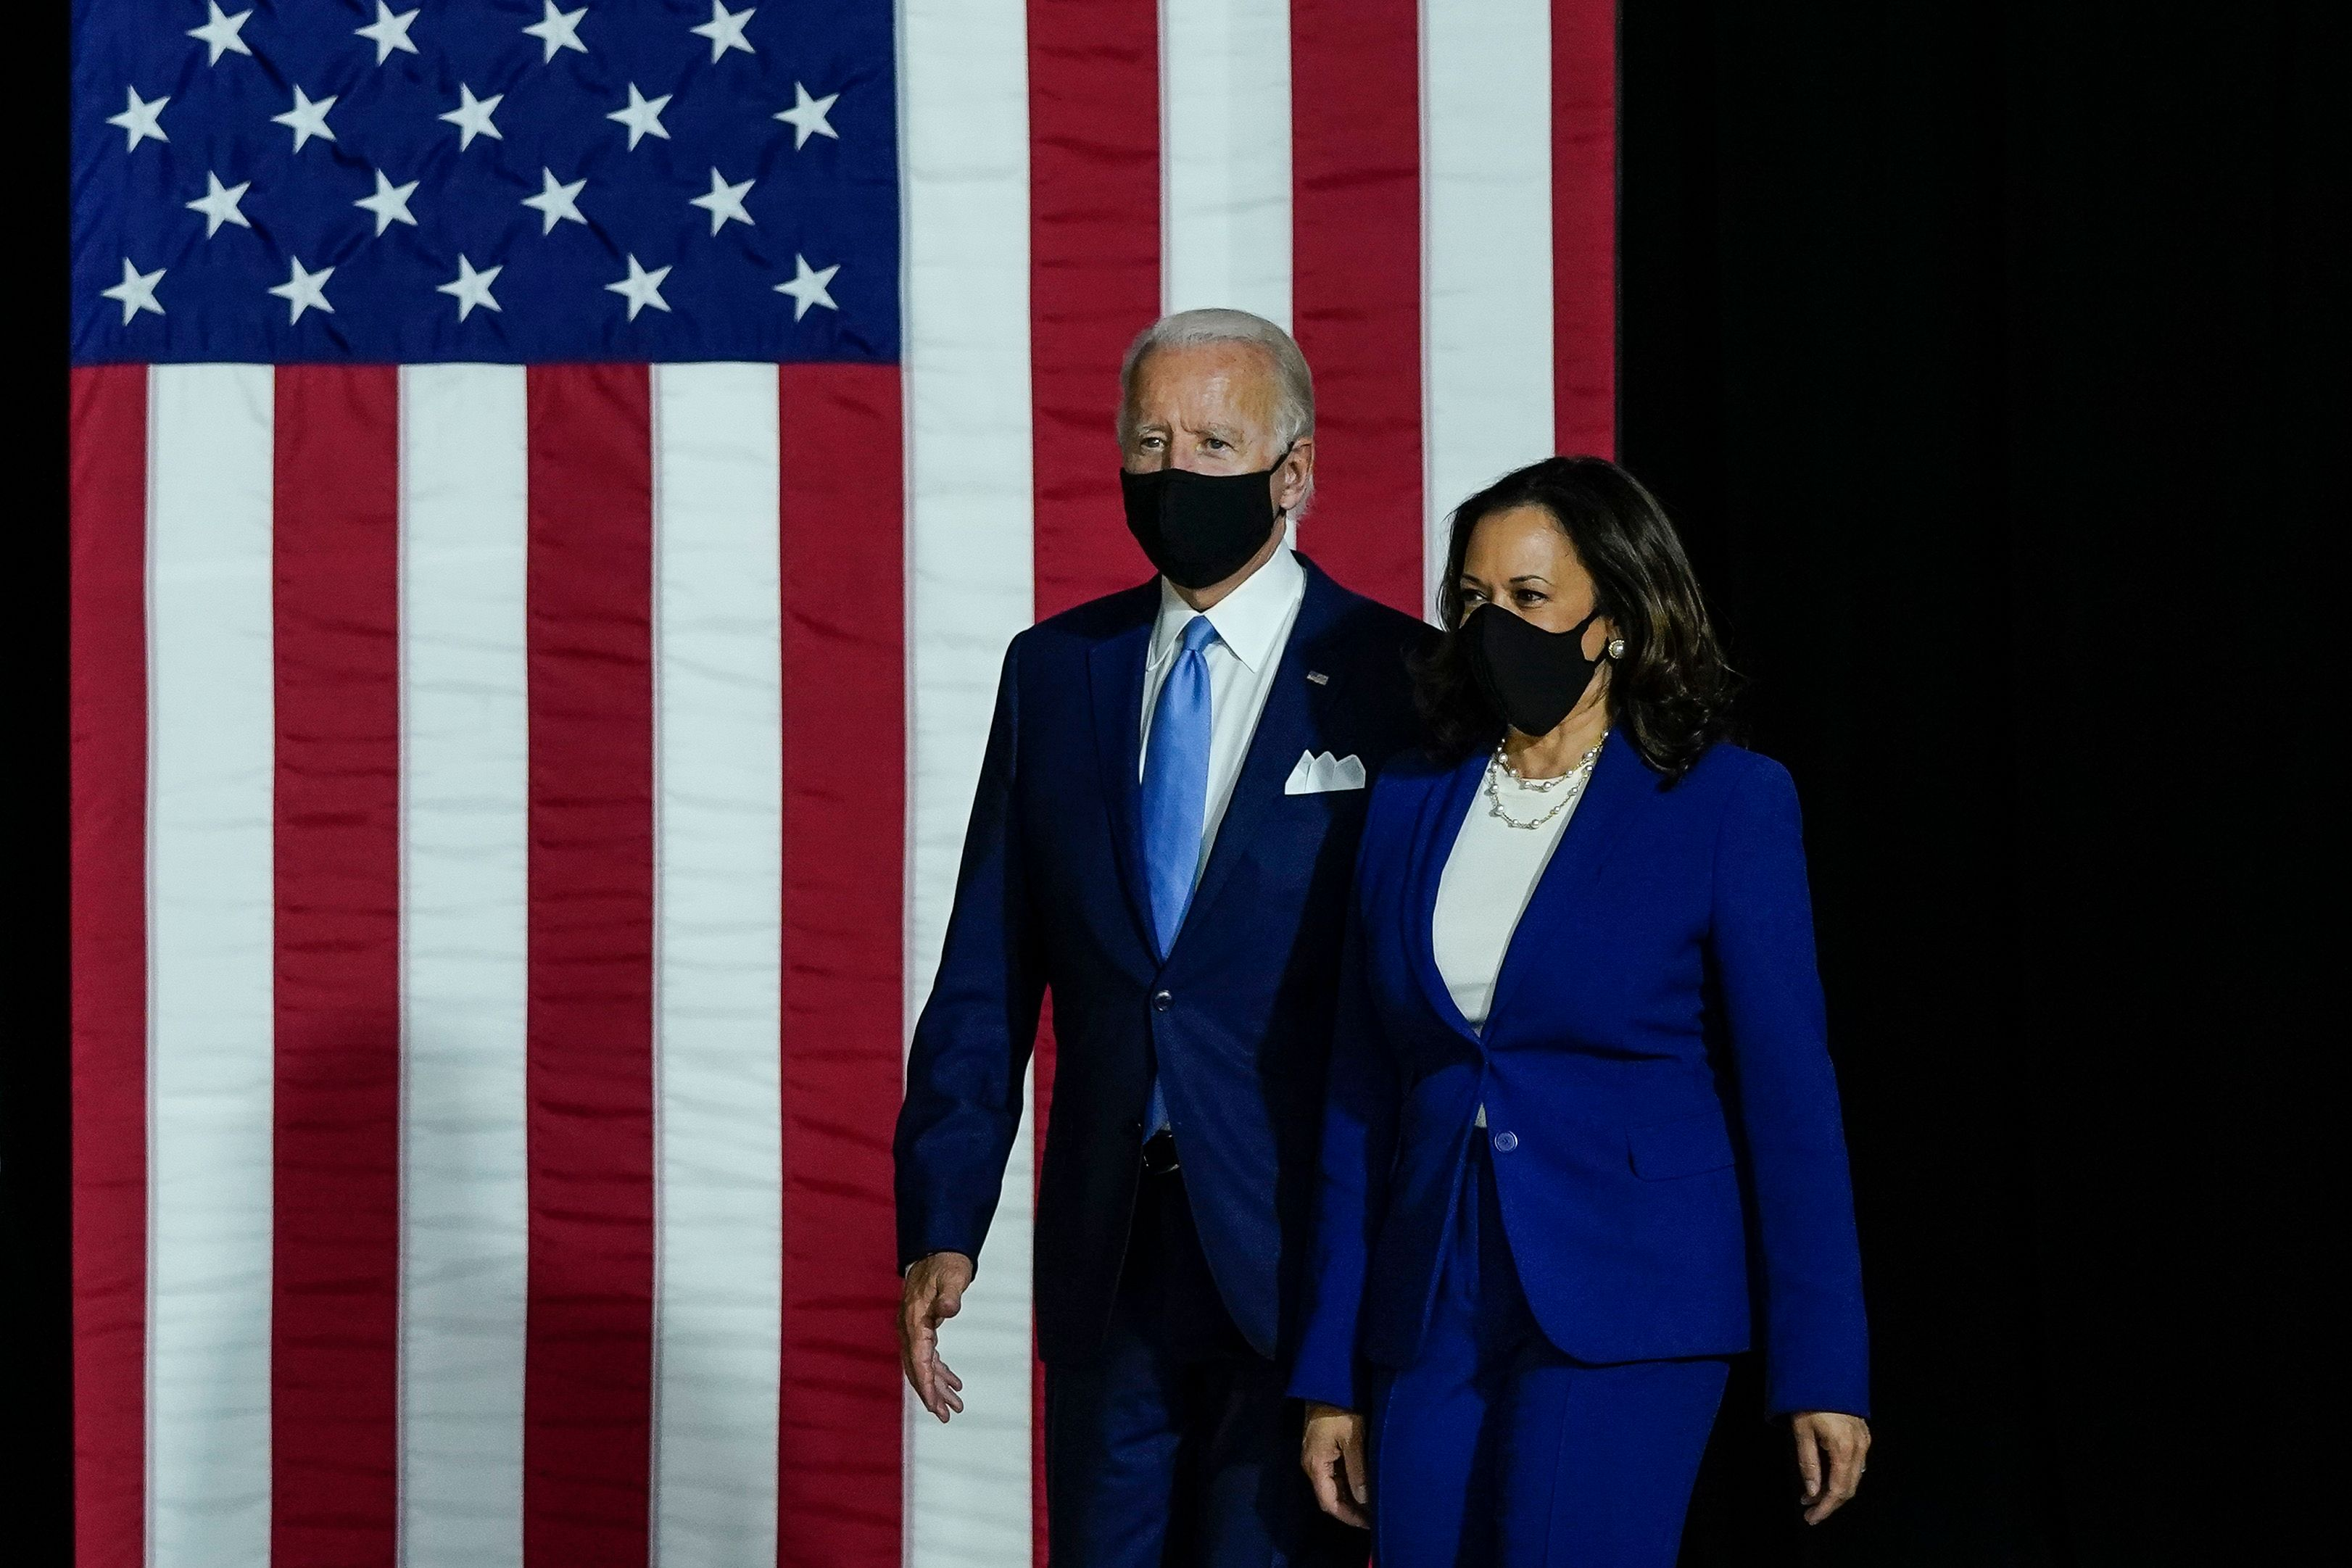 Joe Biden and Kamala Harris in front of an American flag.